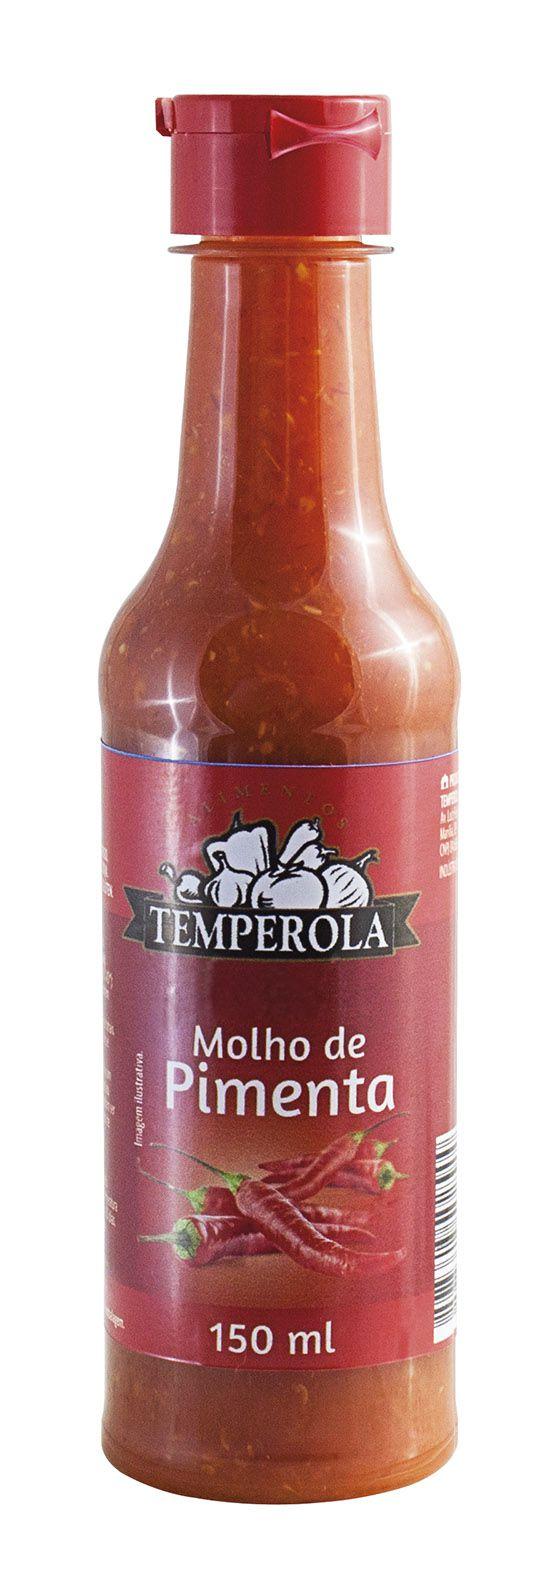 Molho de Pimenta Tradicional 150 ml